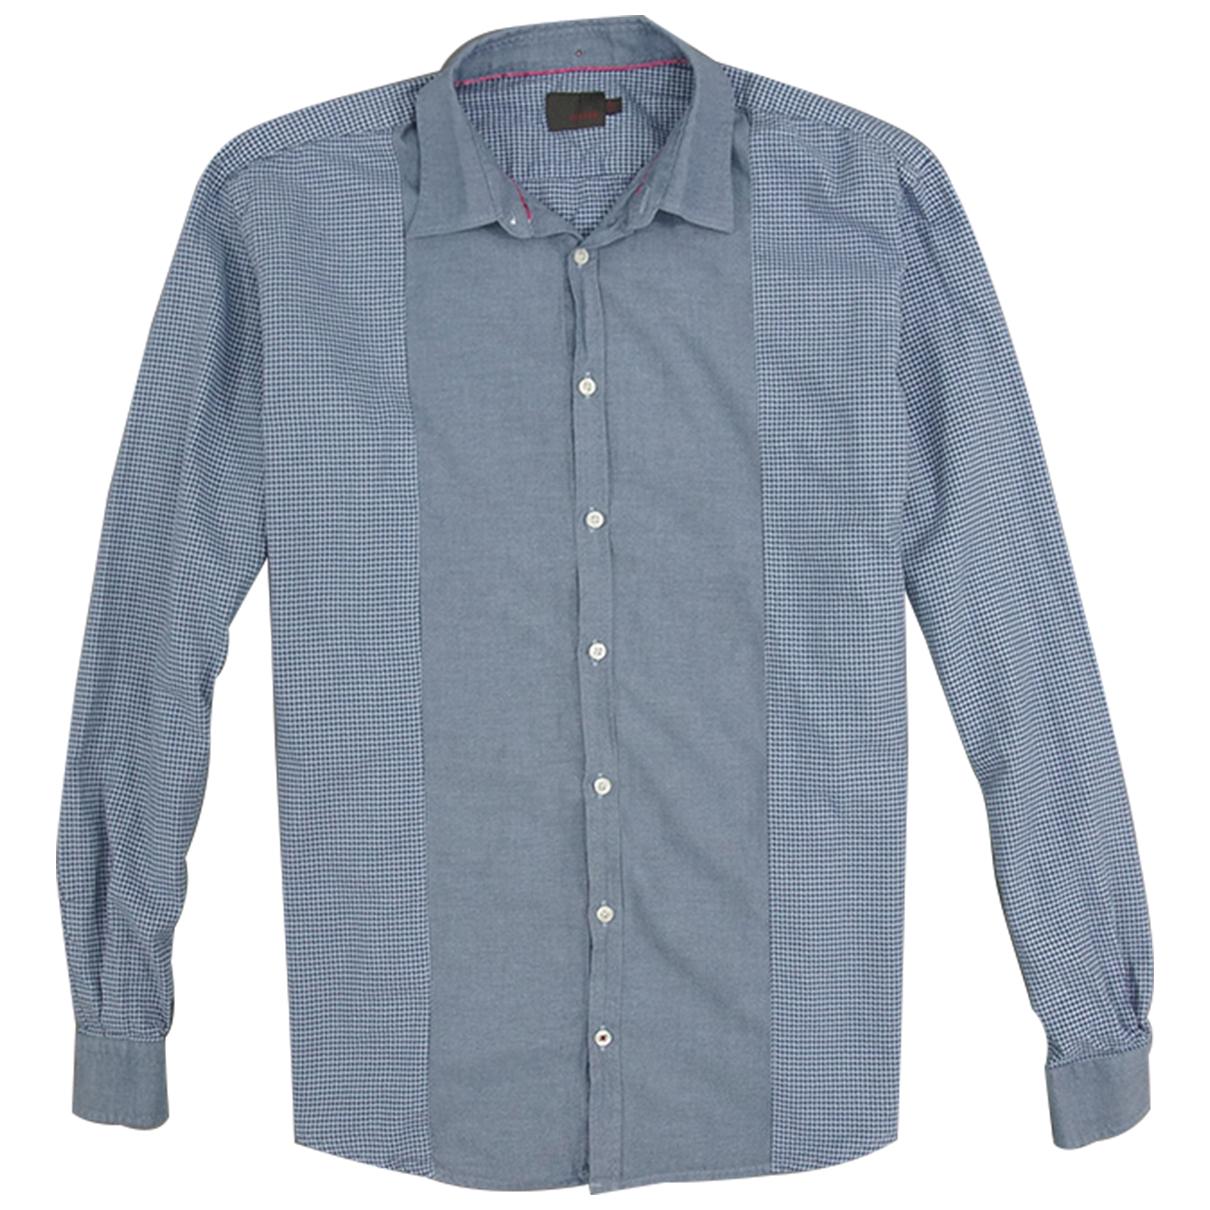 Louis Feraud \N Blue Cotton Shirts for Men 41 EU (tour de cou / collar)